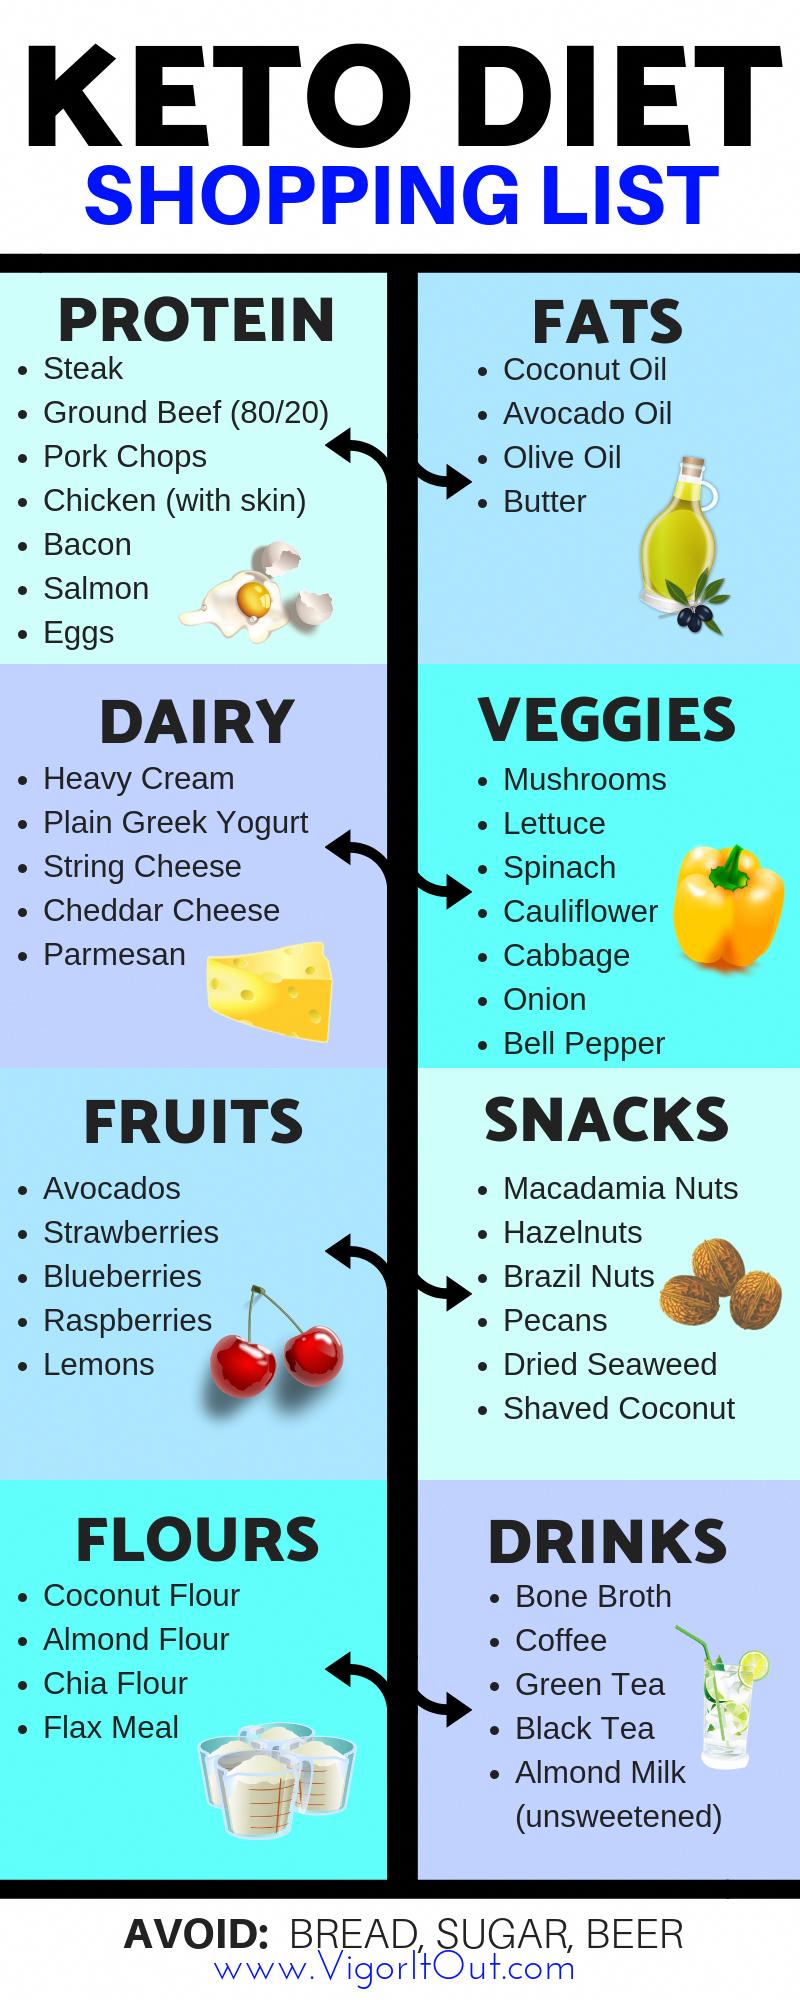 Diy Homemade Keto Diet Explained Ketodietweightloss